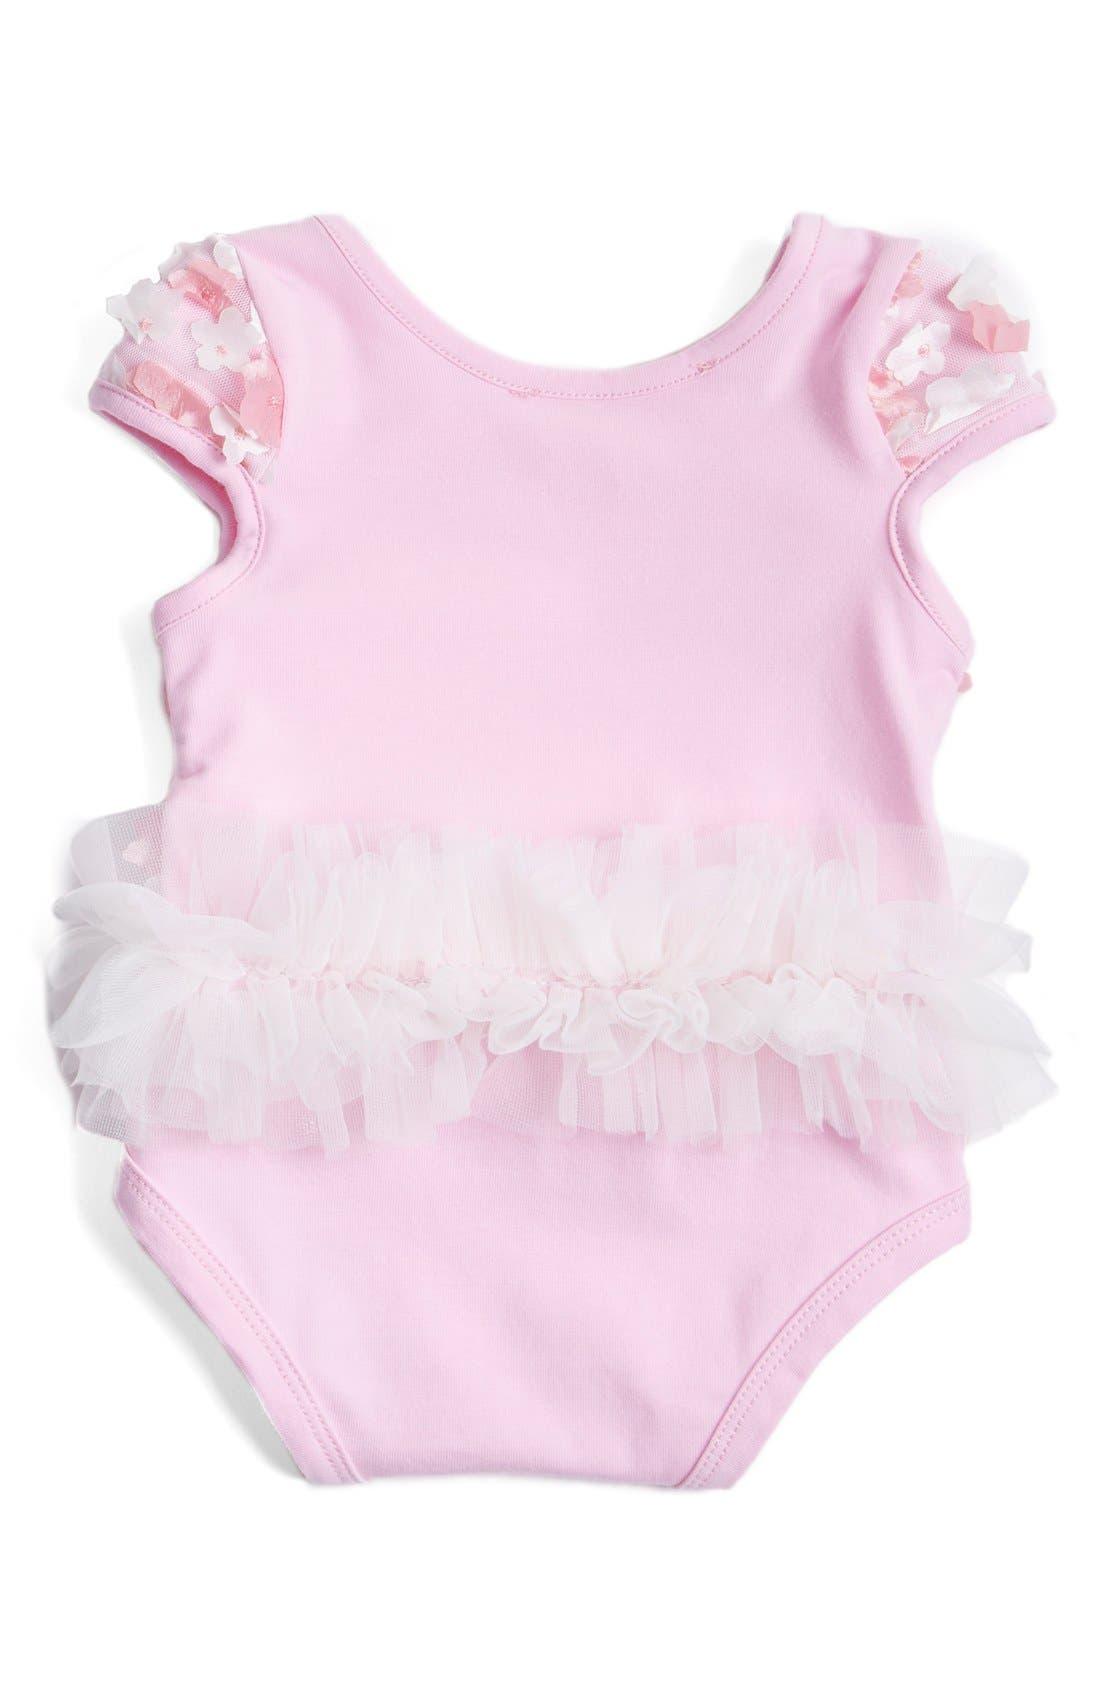 Tulle Bodysuit,                             Alternate thumbnail 2, color,                             Pink